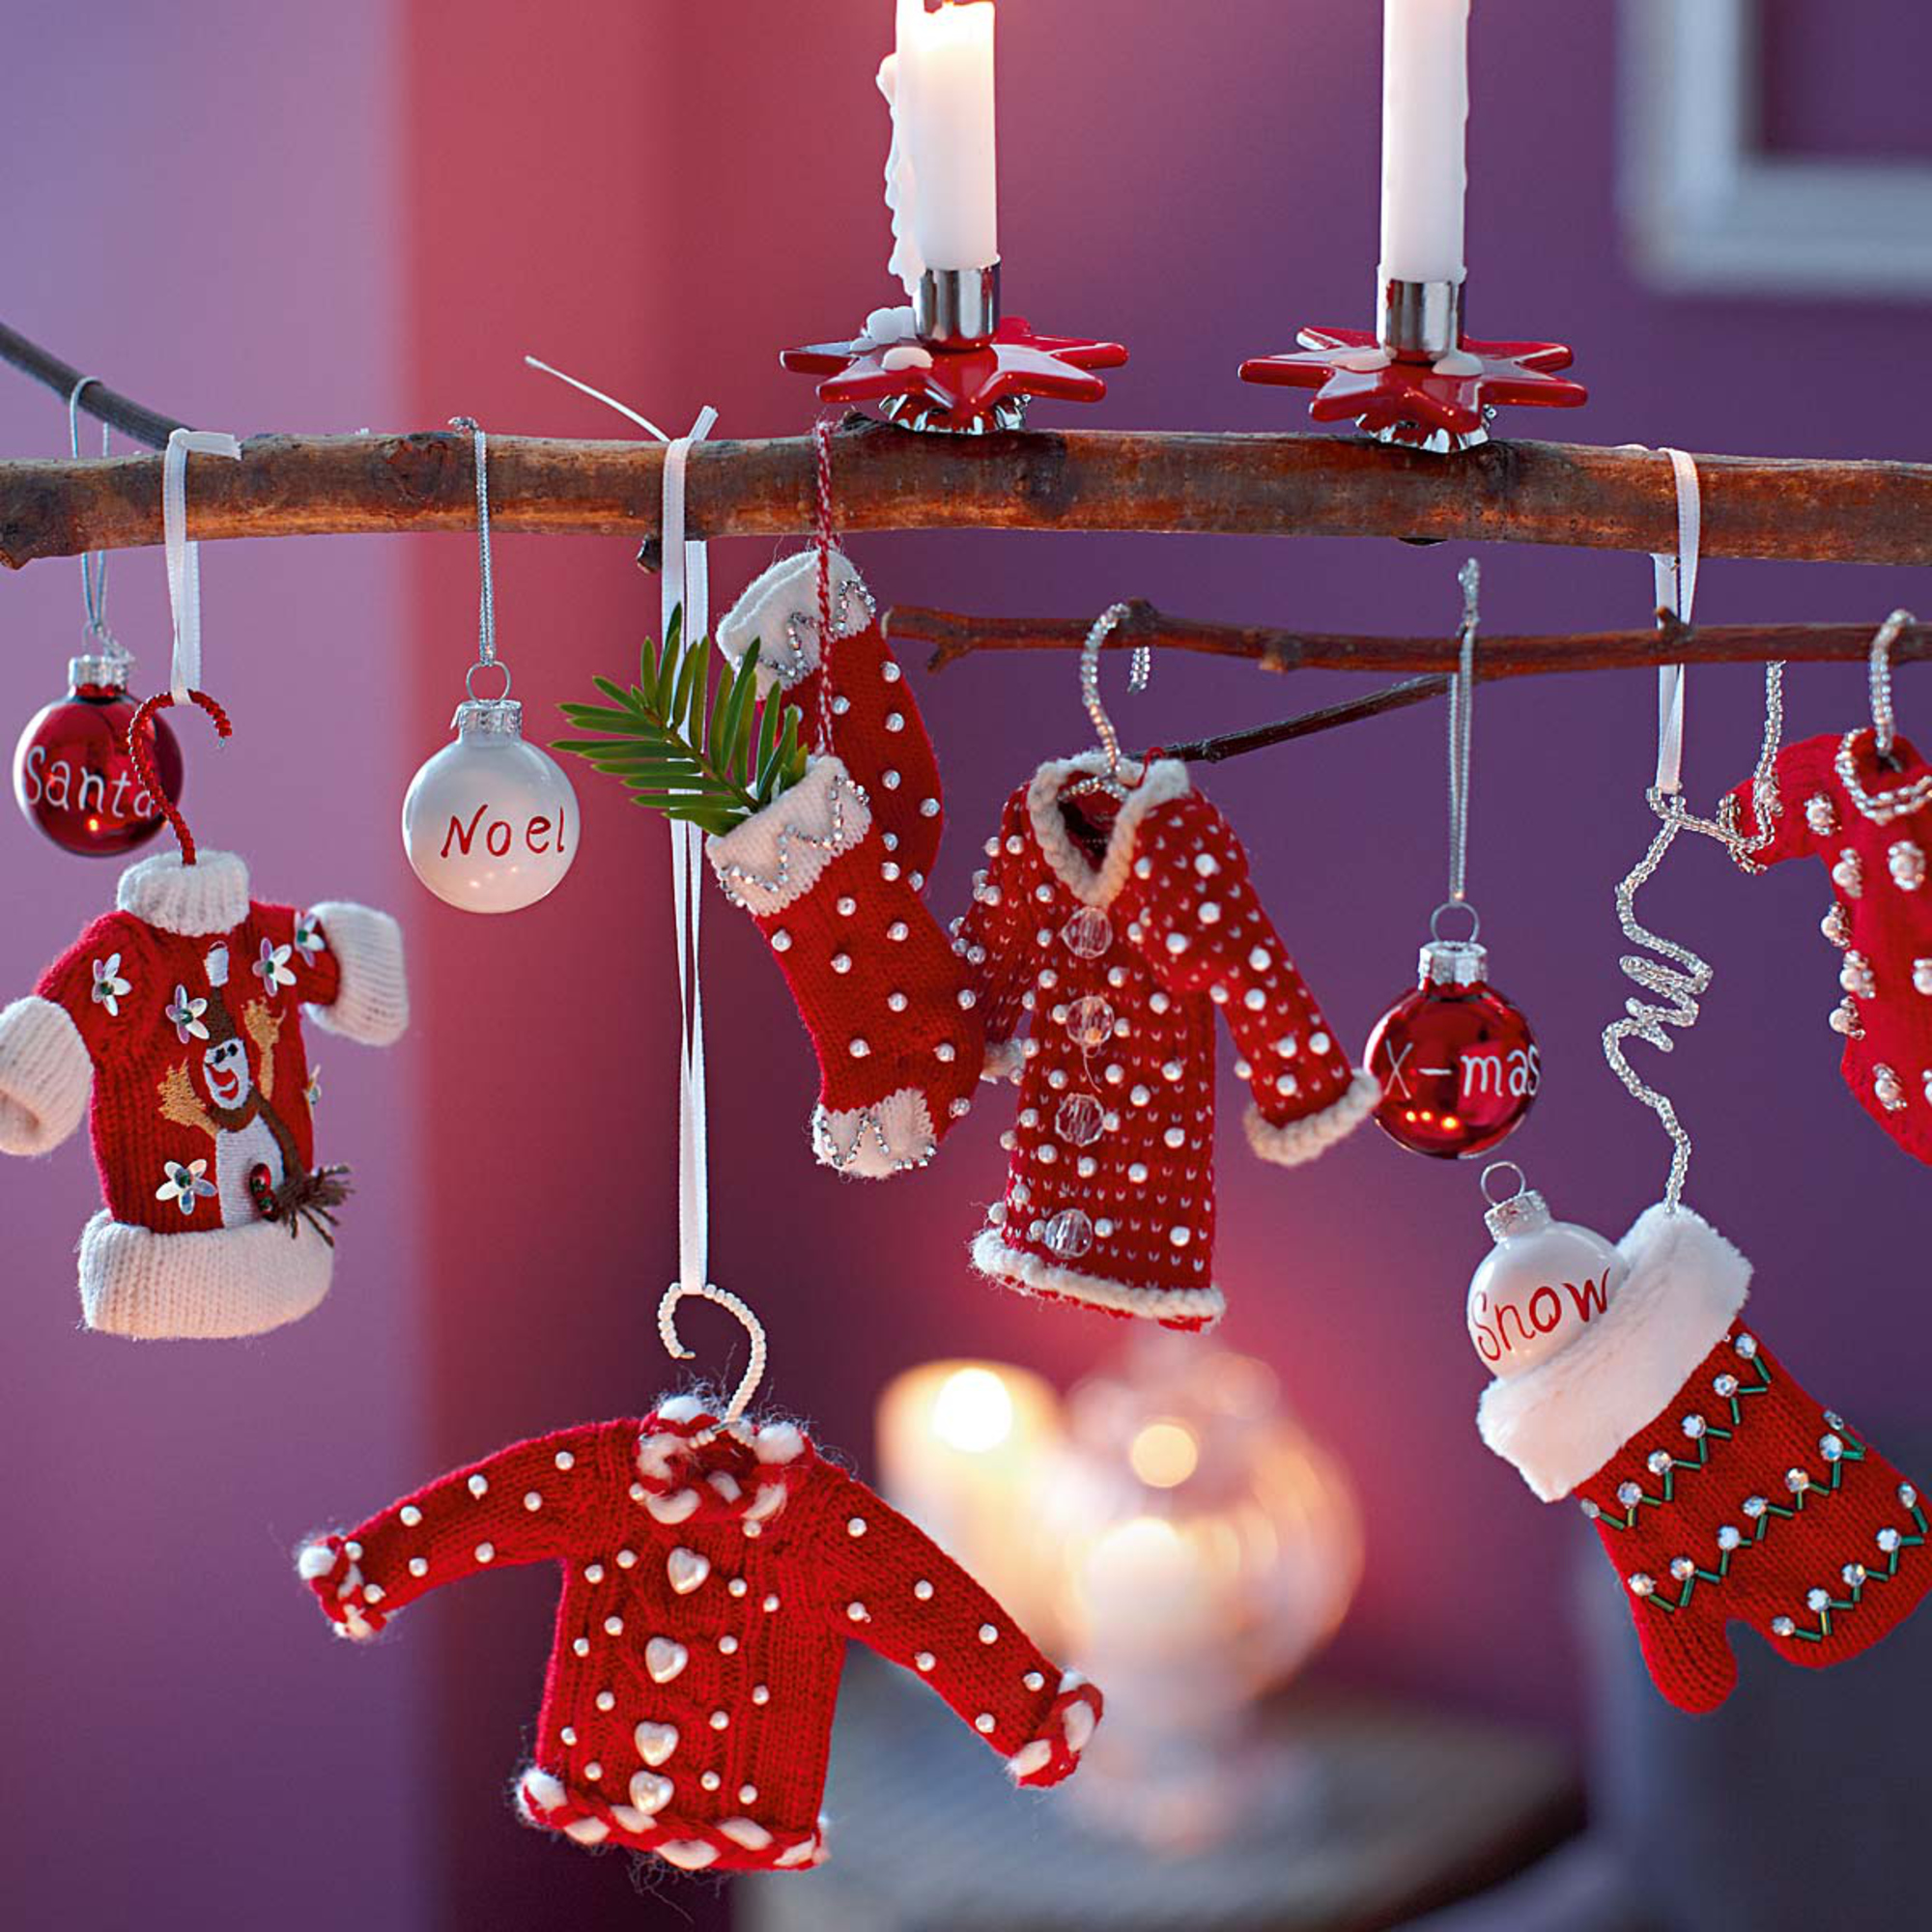 christmas decorations ideas   TrellisChicago